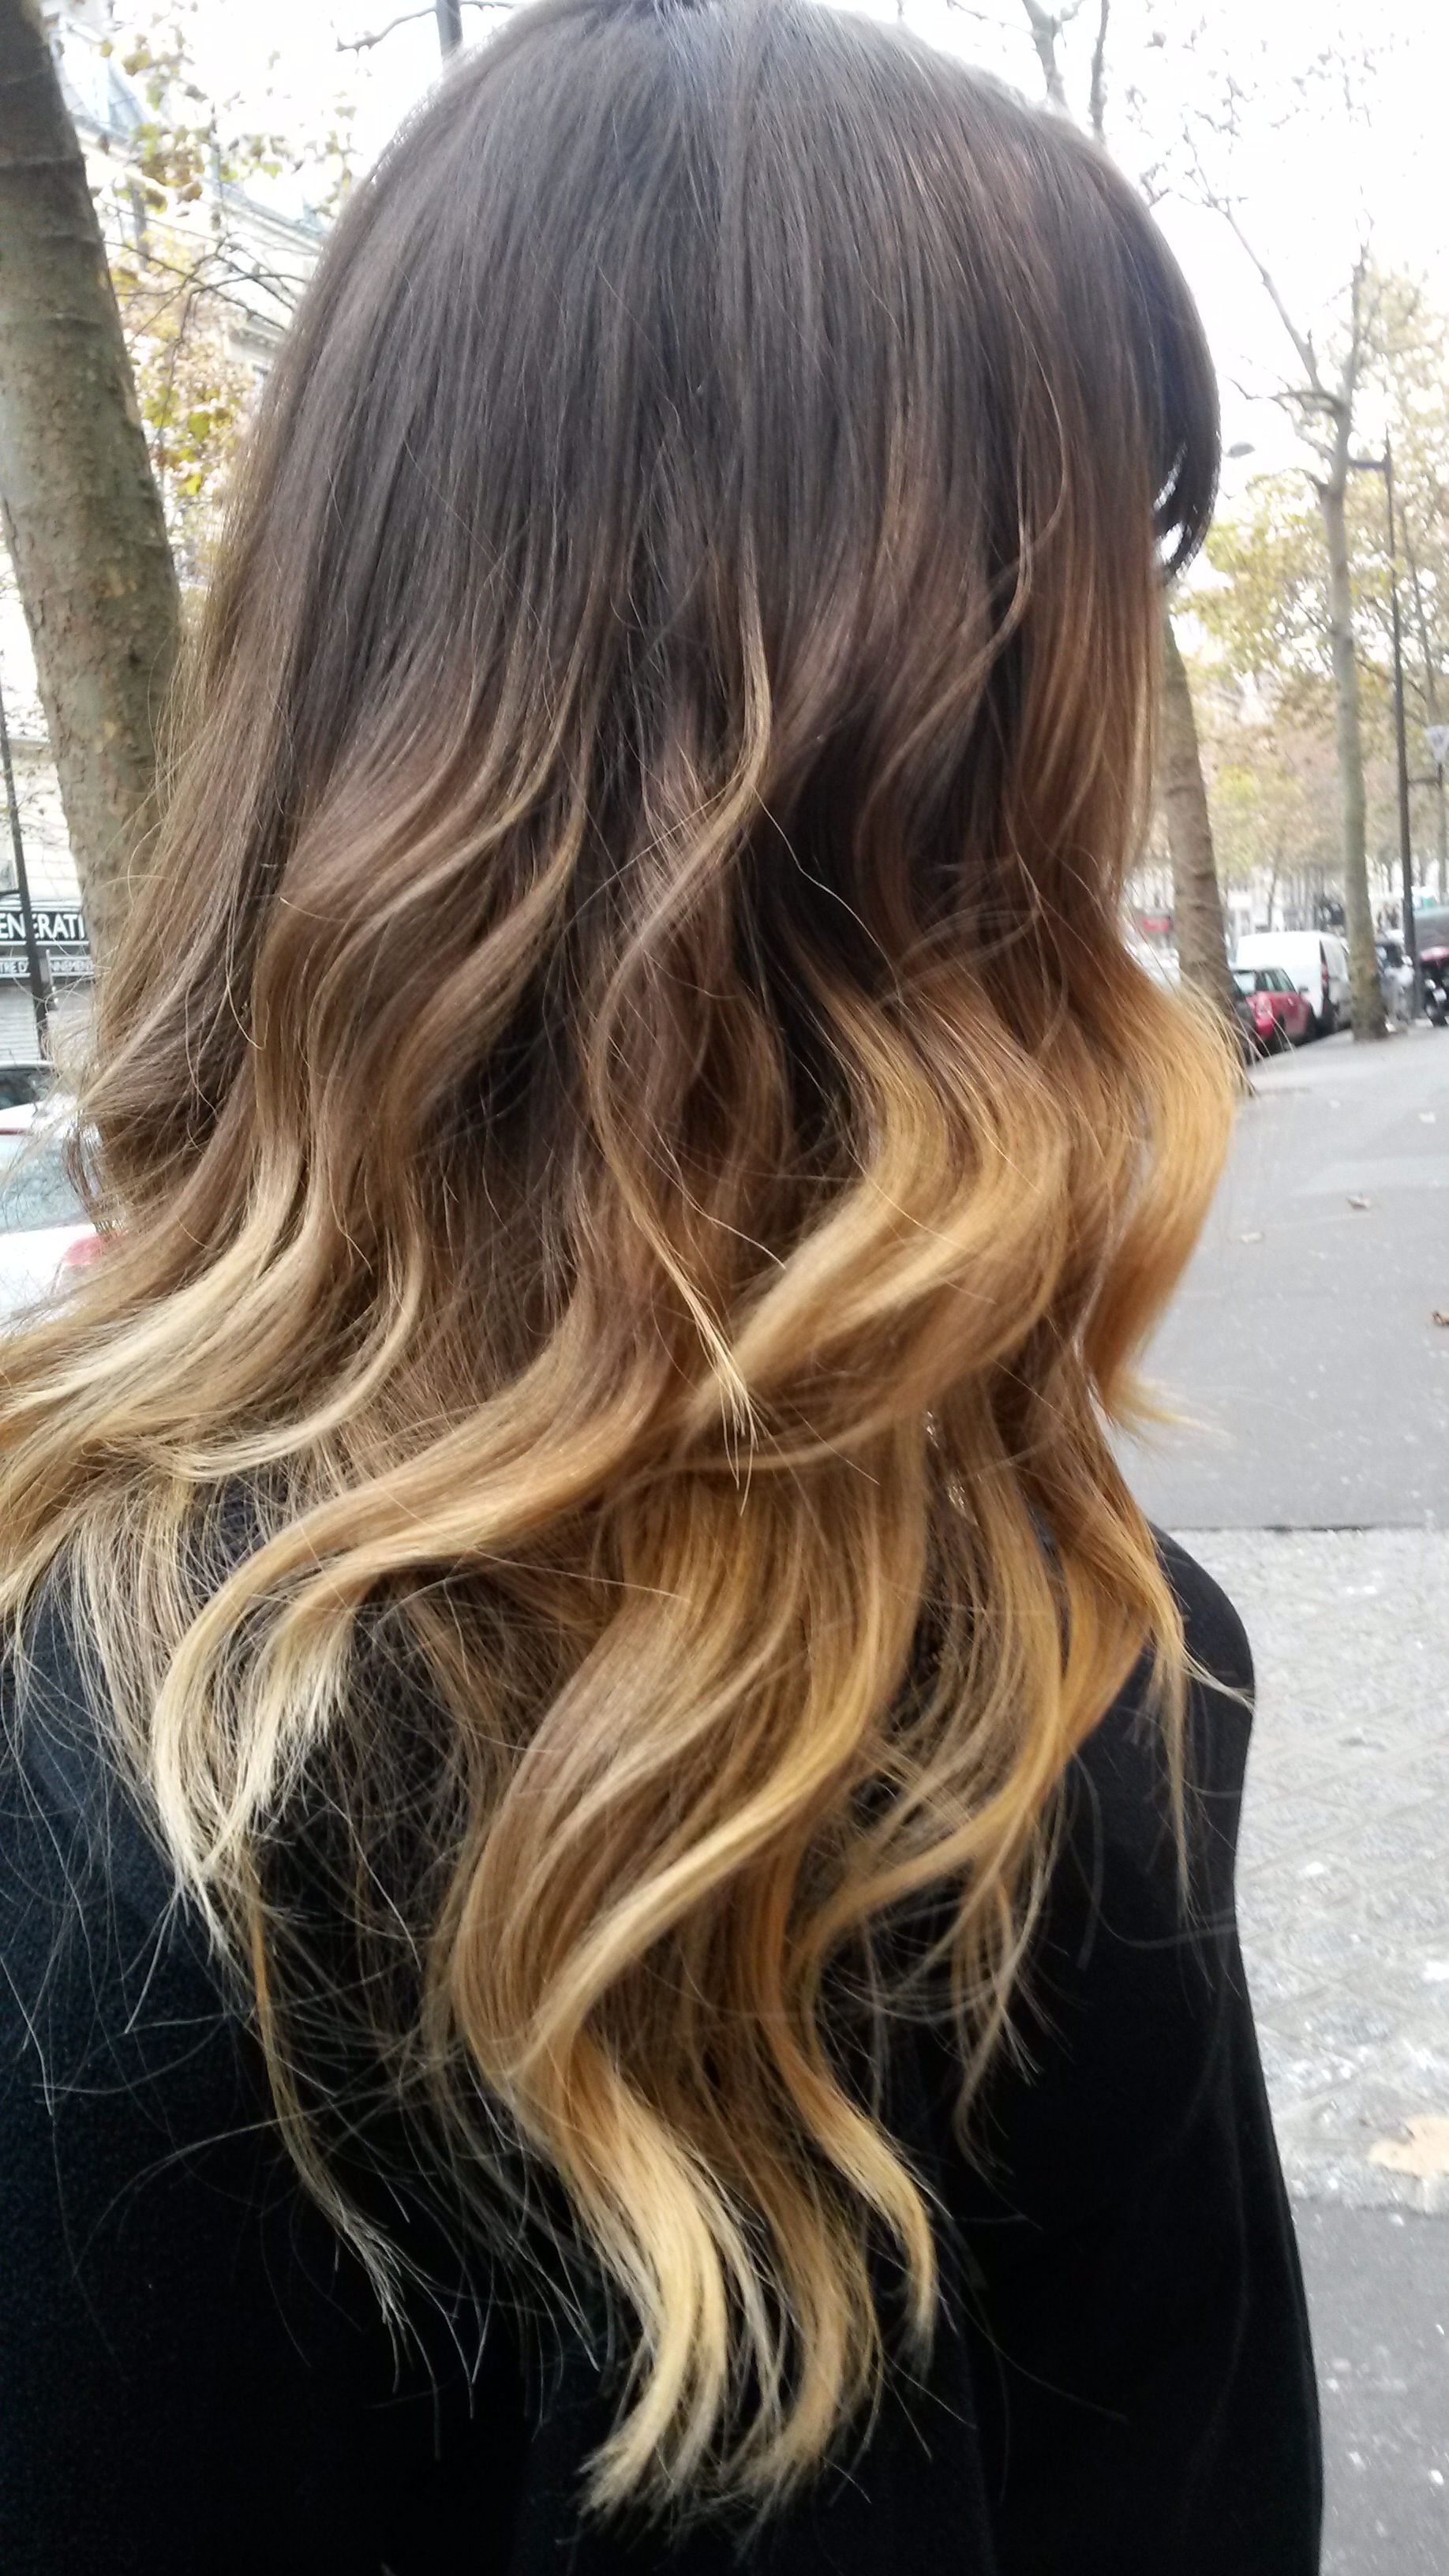 Couleur Bronde Corinne Dahan Coiffure Bronde Teinture Cheveux Bruns Teinture Cheveux Cheveux